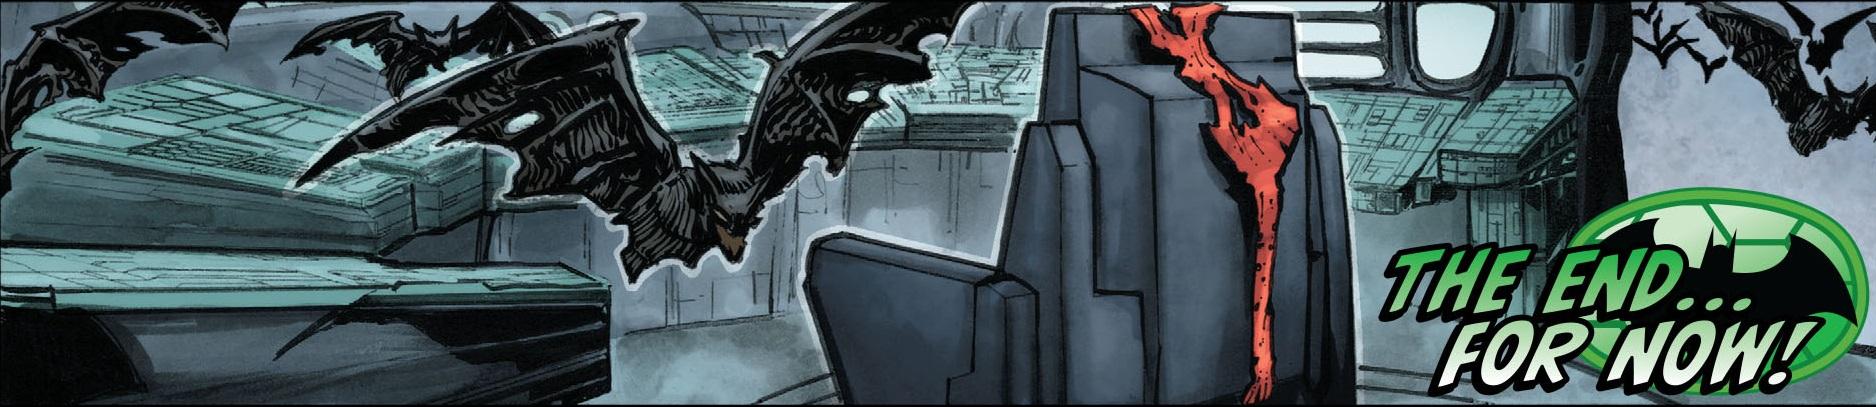 BatmanTMNY lastpage